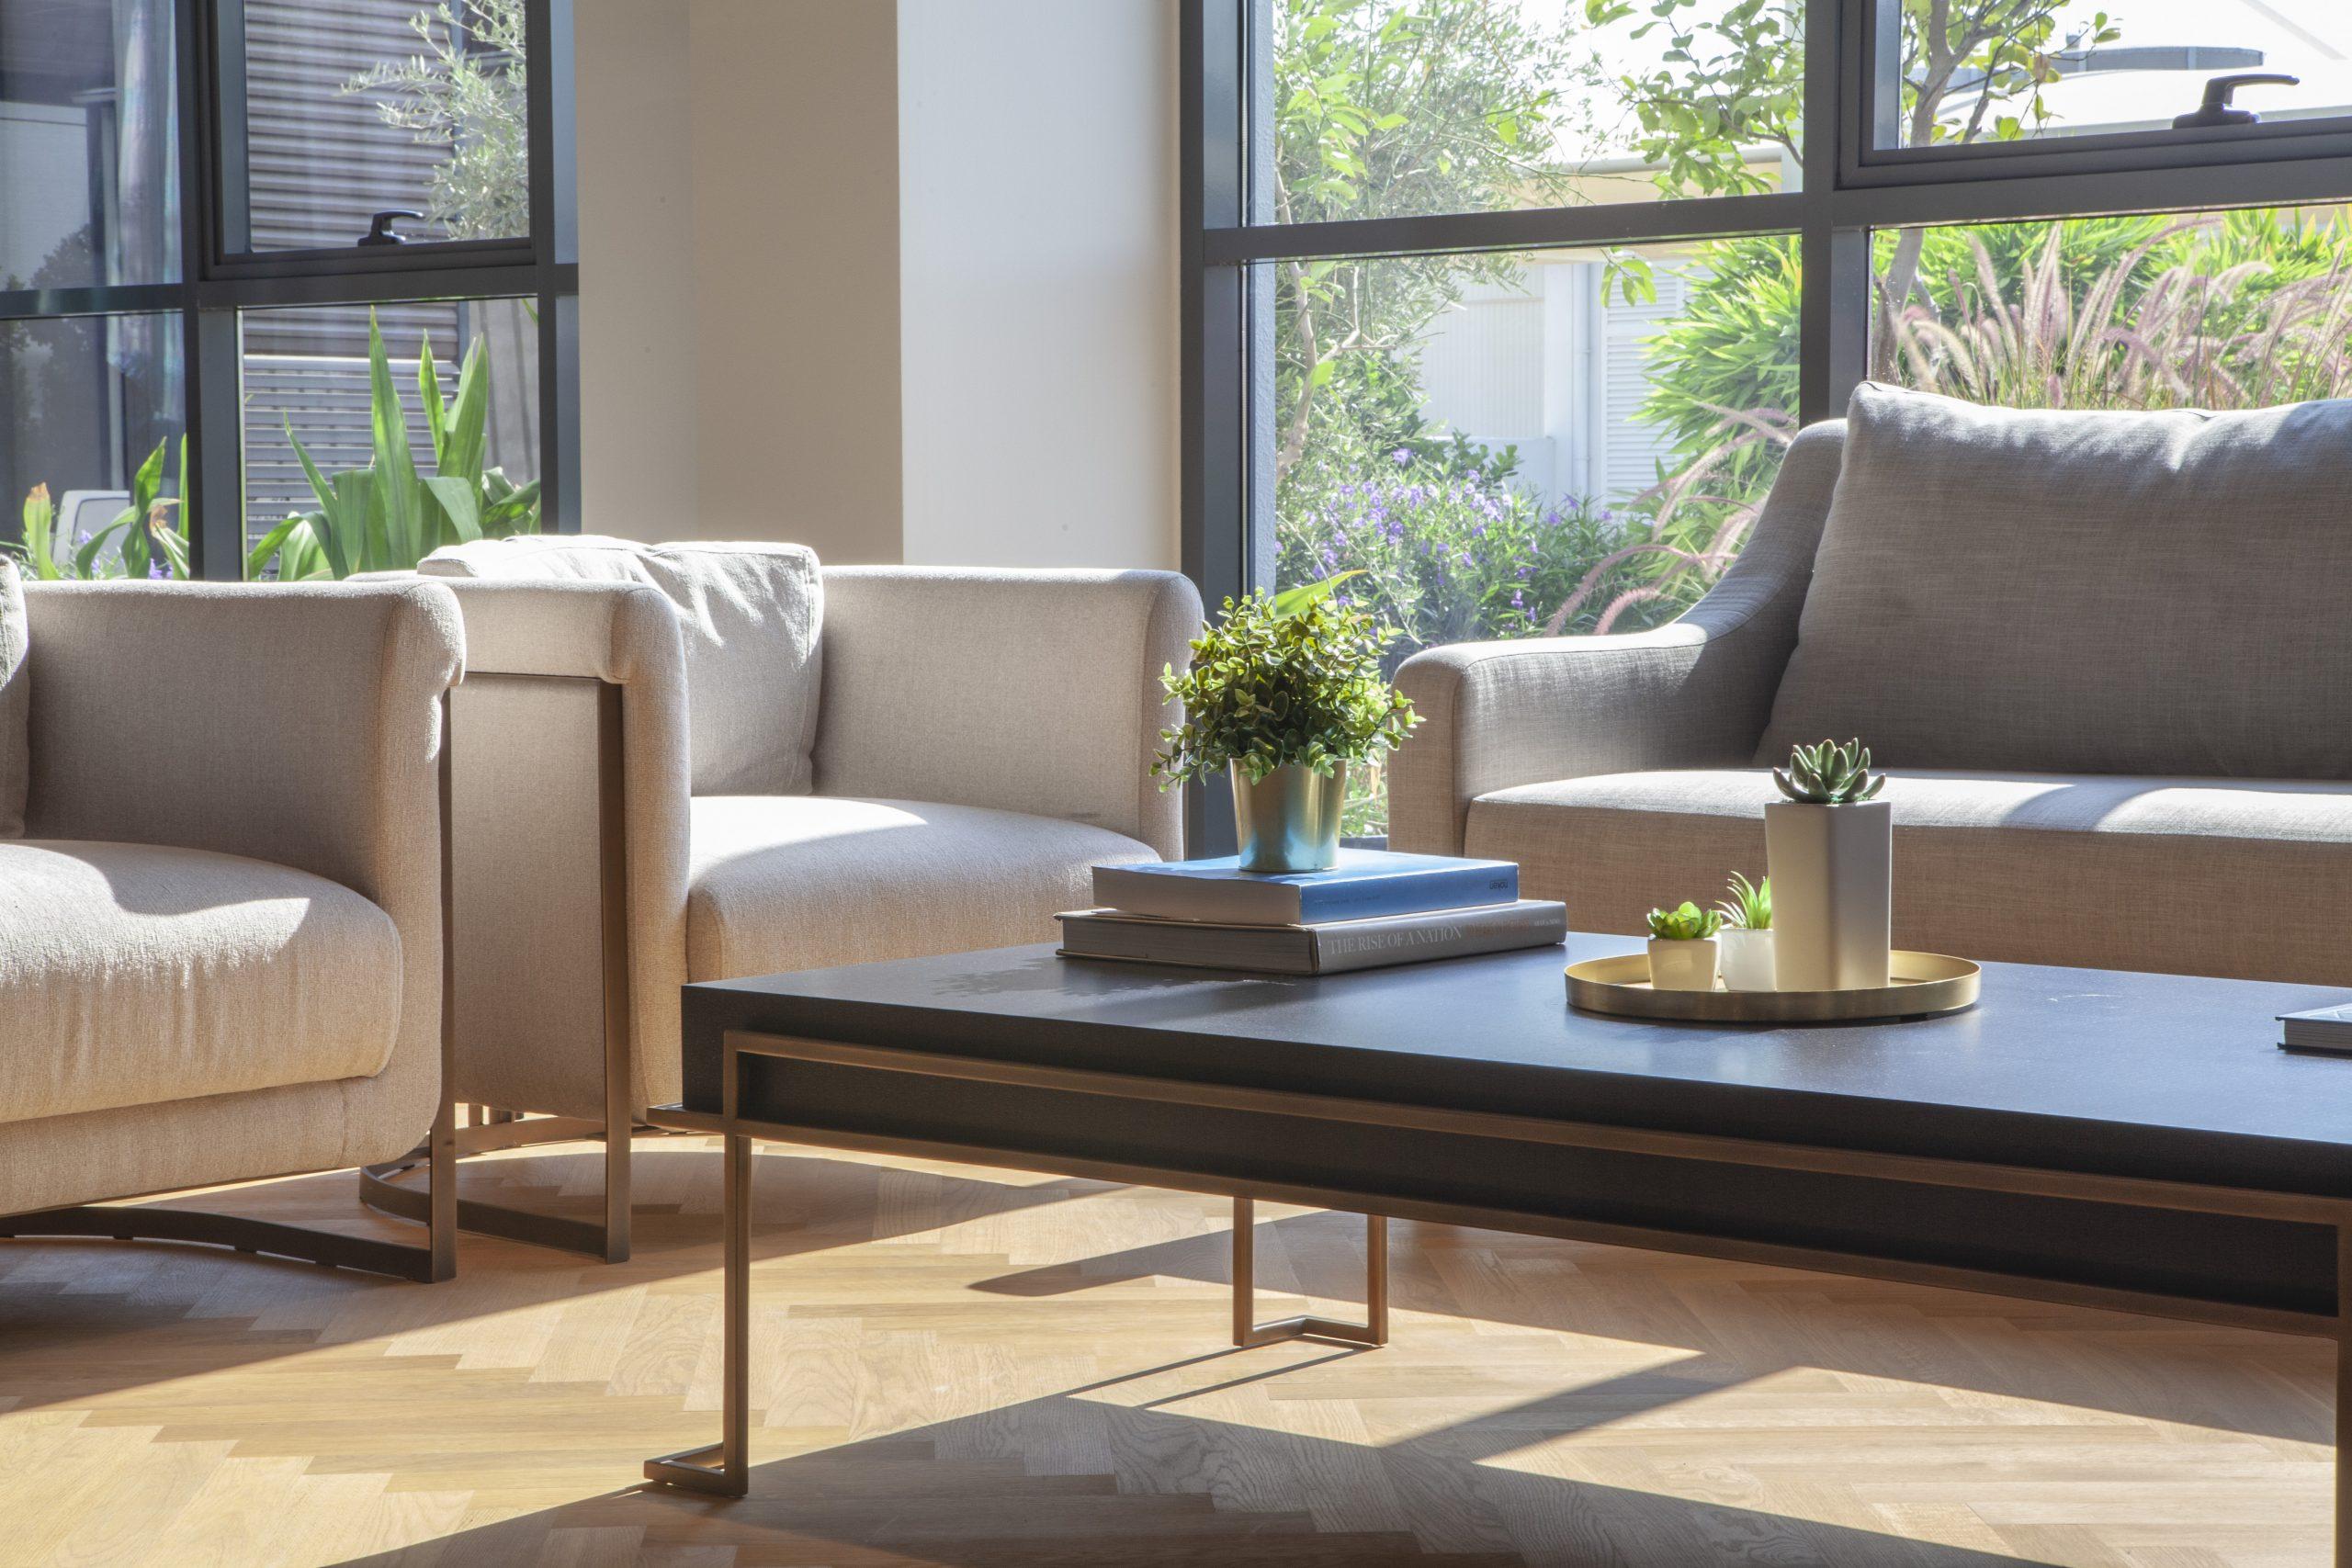 Bespoke Furniture 13 Cherwell